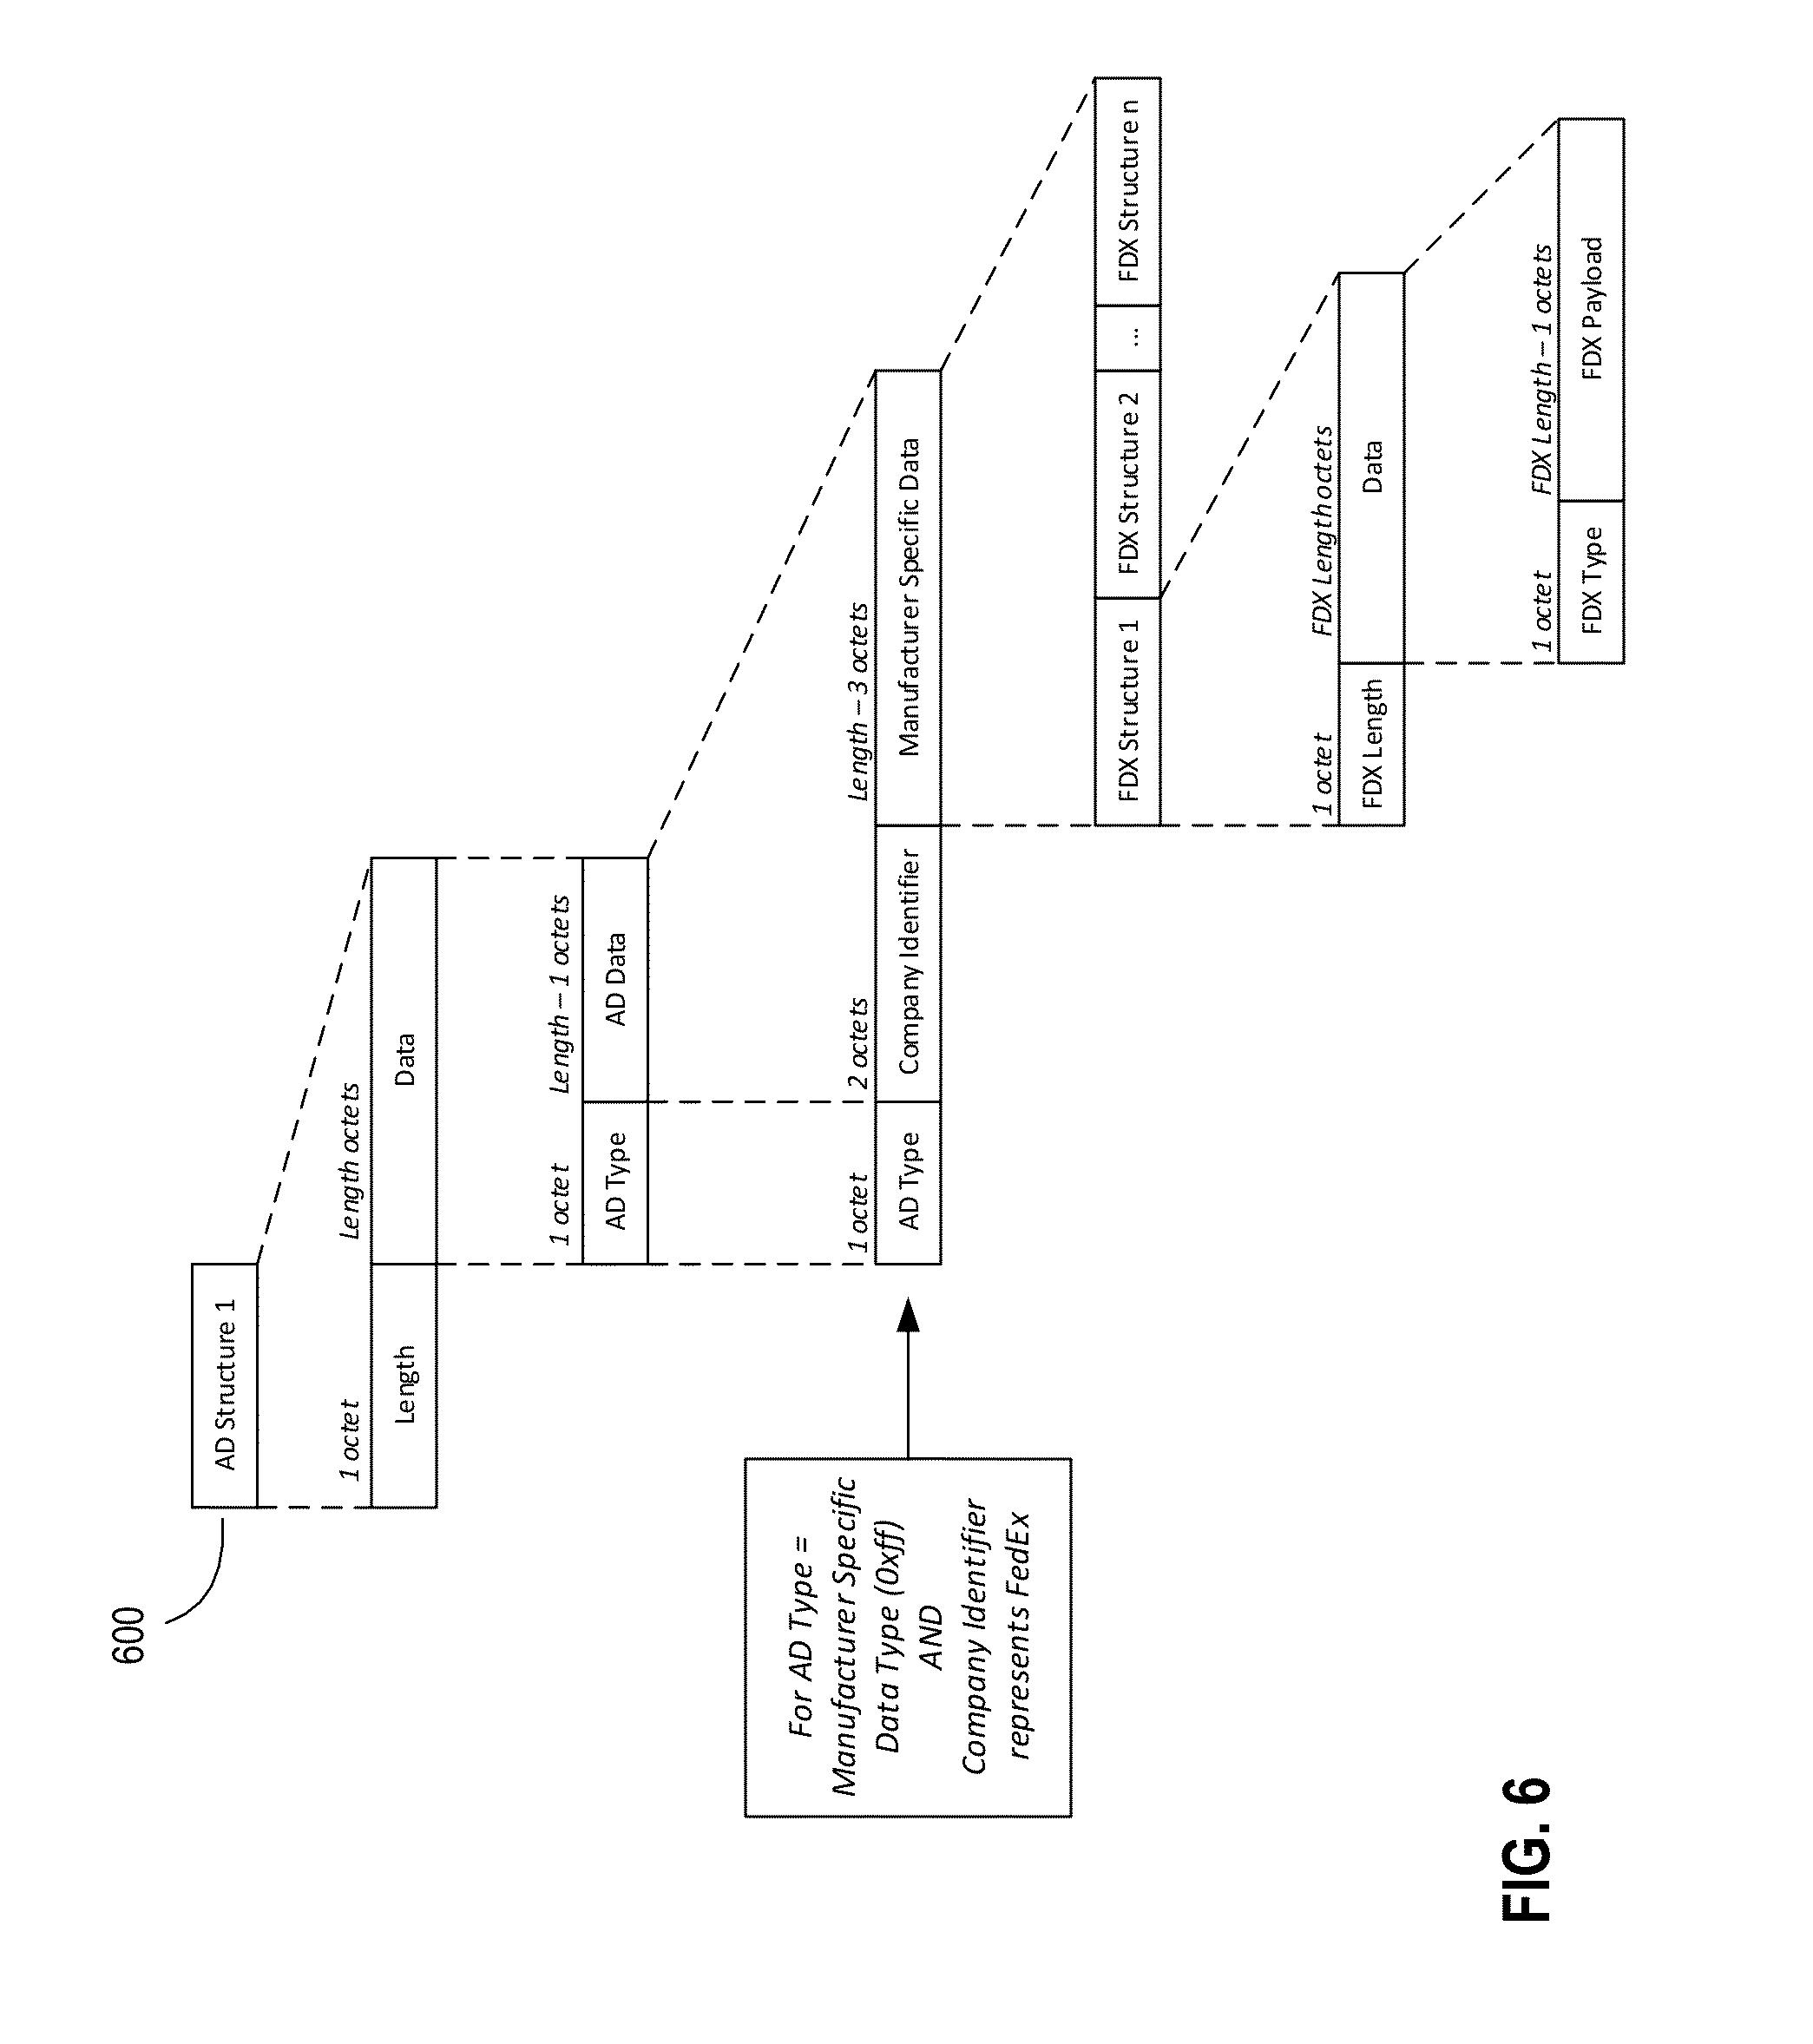 Patent Us 9402242 B2 Generator Op Circuit Moreover 555 Timer Diagram Likewise Smart